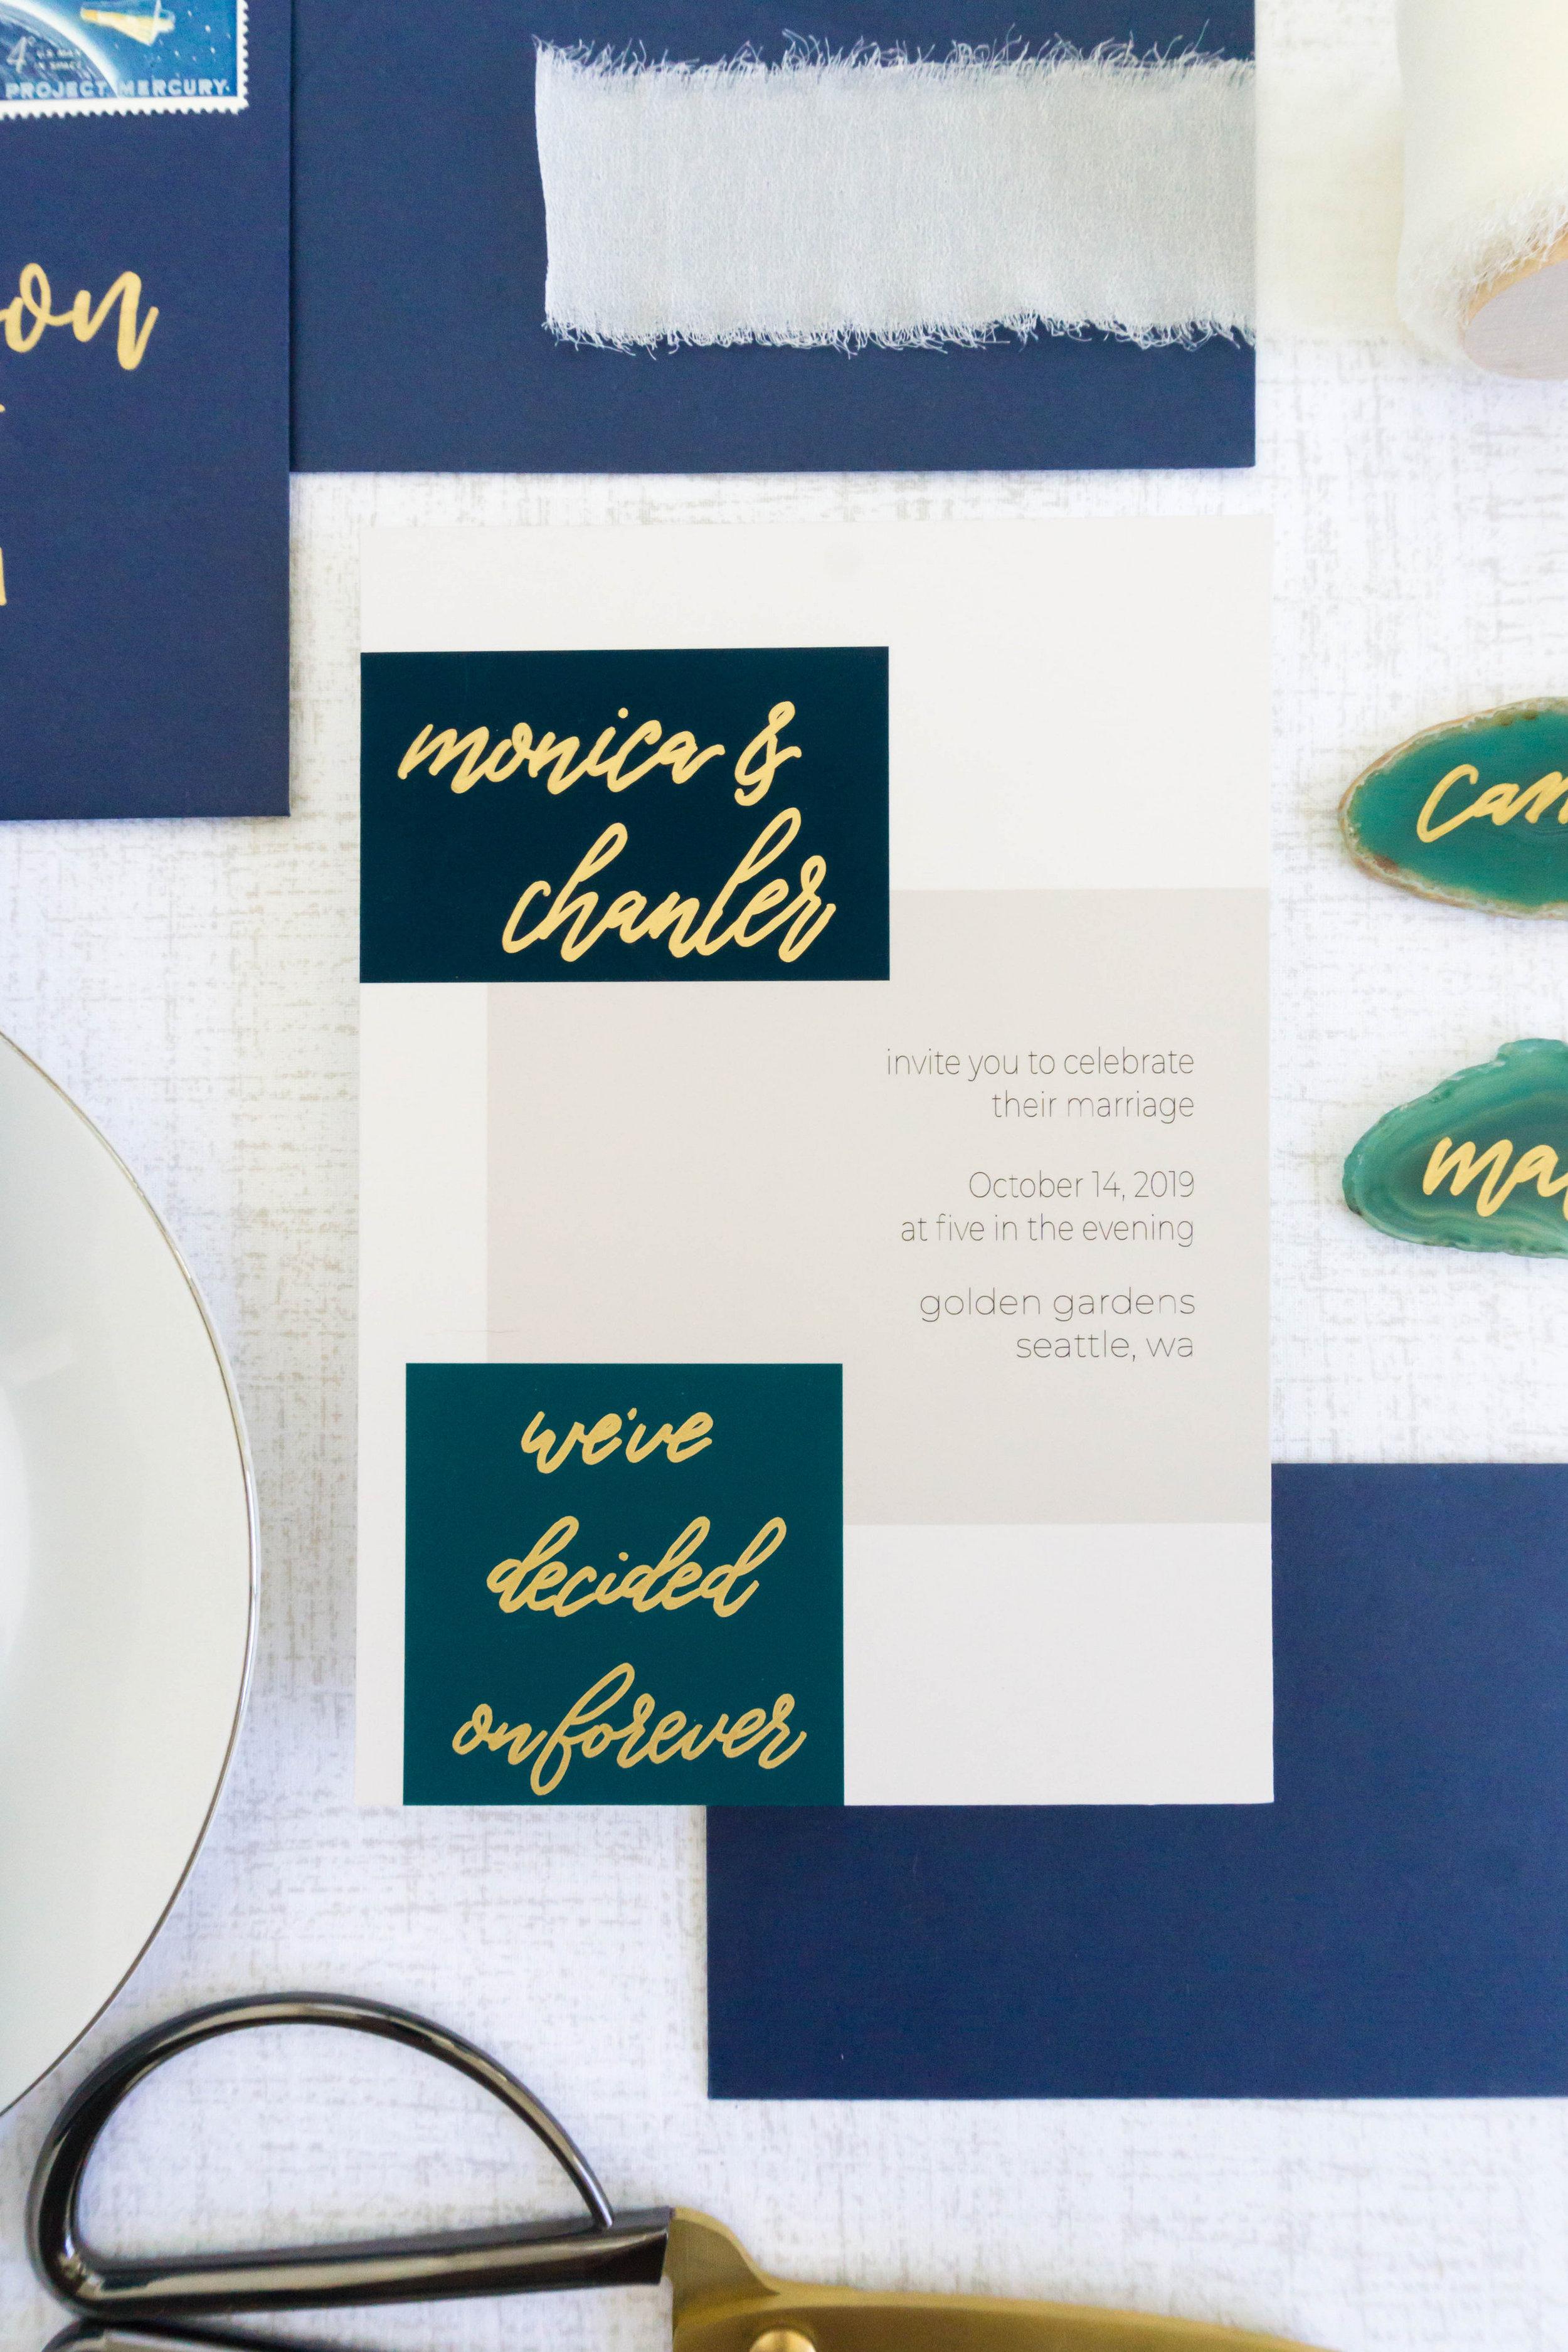 love-fern-design-studio-custom-wedding-invitations-for-the-modern-couple-modern-calligraphy-in-seattle-washington-custom-wedding-stationery-navy-gold-teal-modern-color-block-invitation